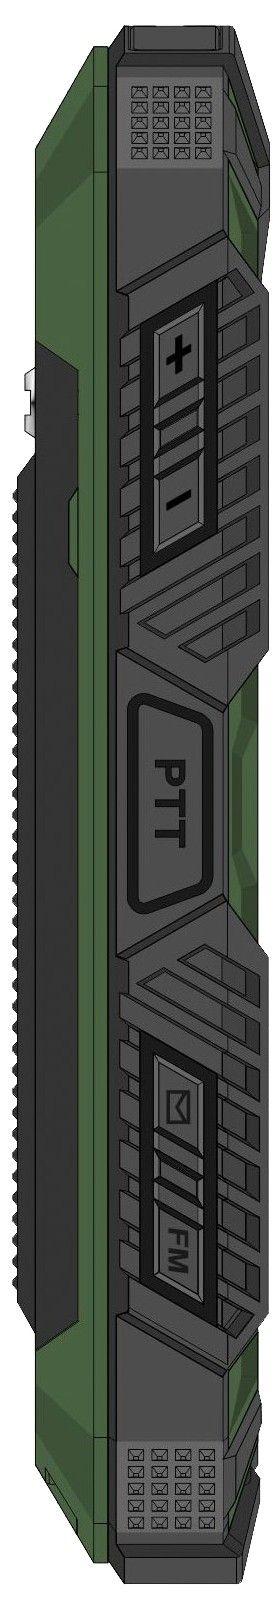 Мобильный телефон Sigma mobile X-treme PQ15 Green - 2